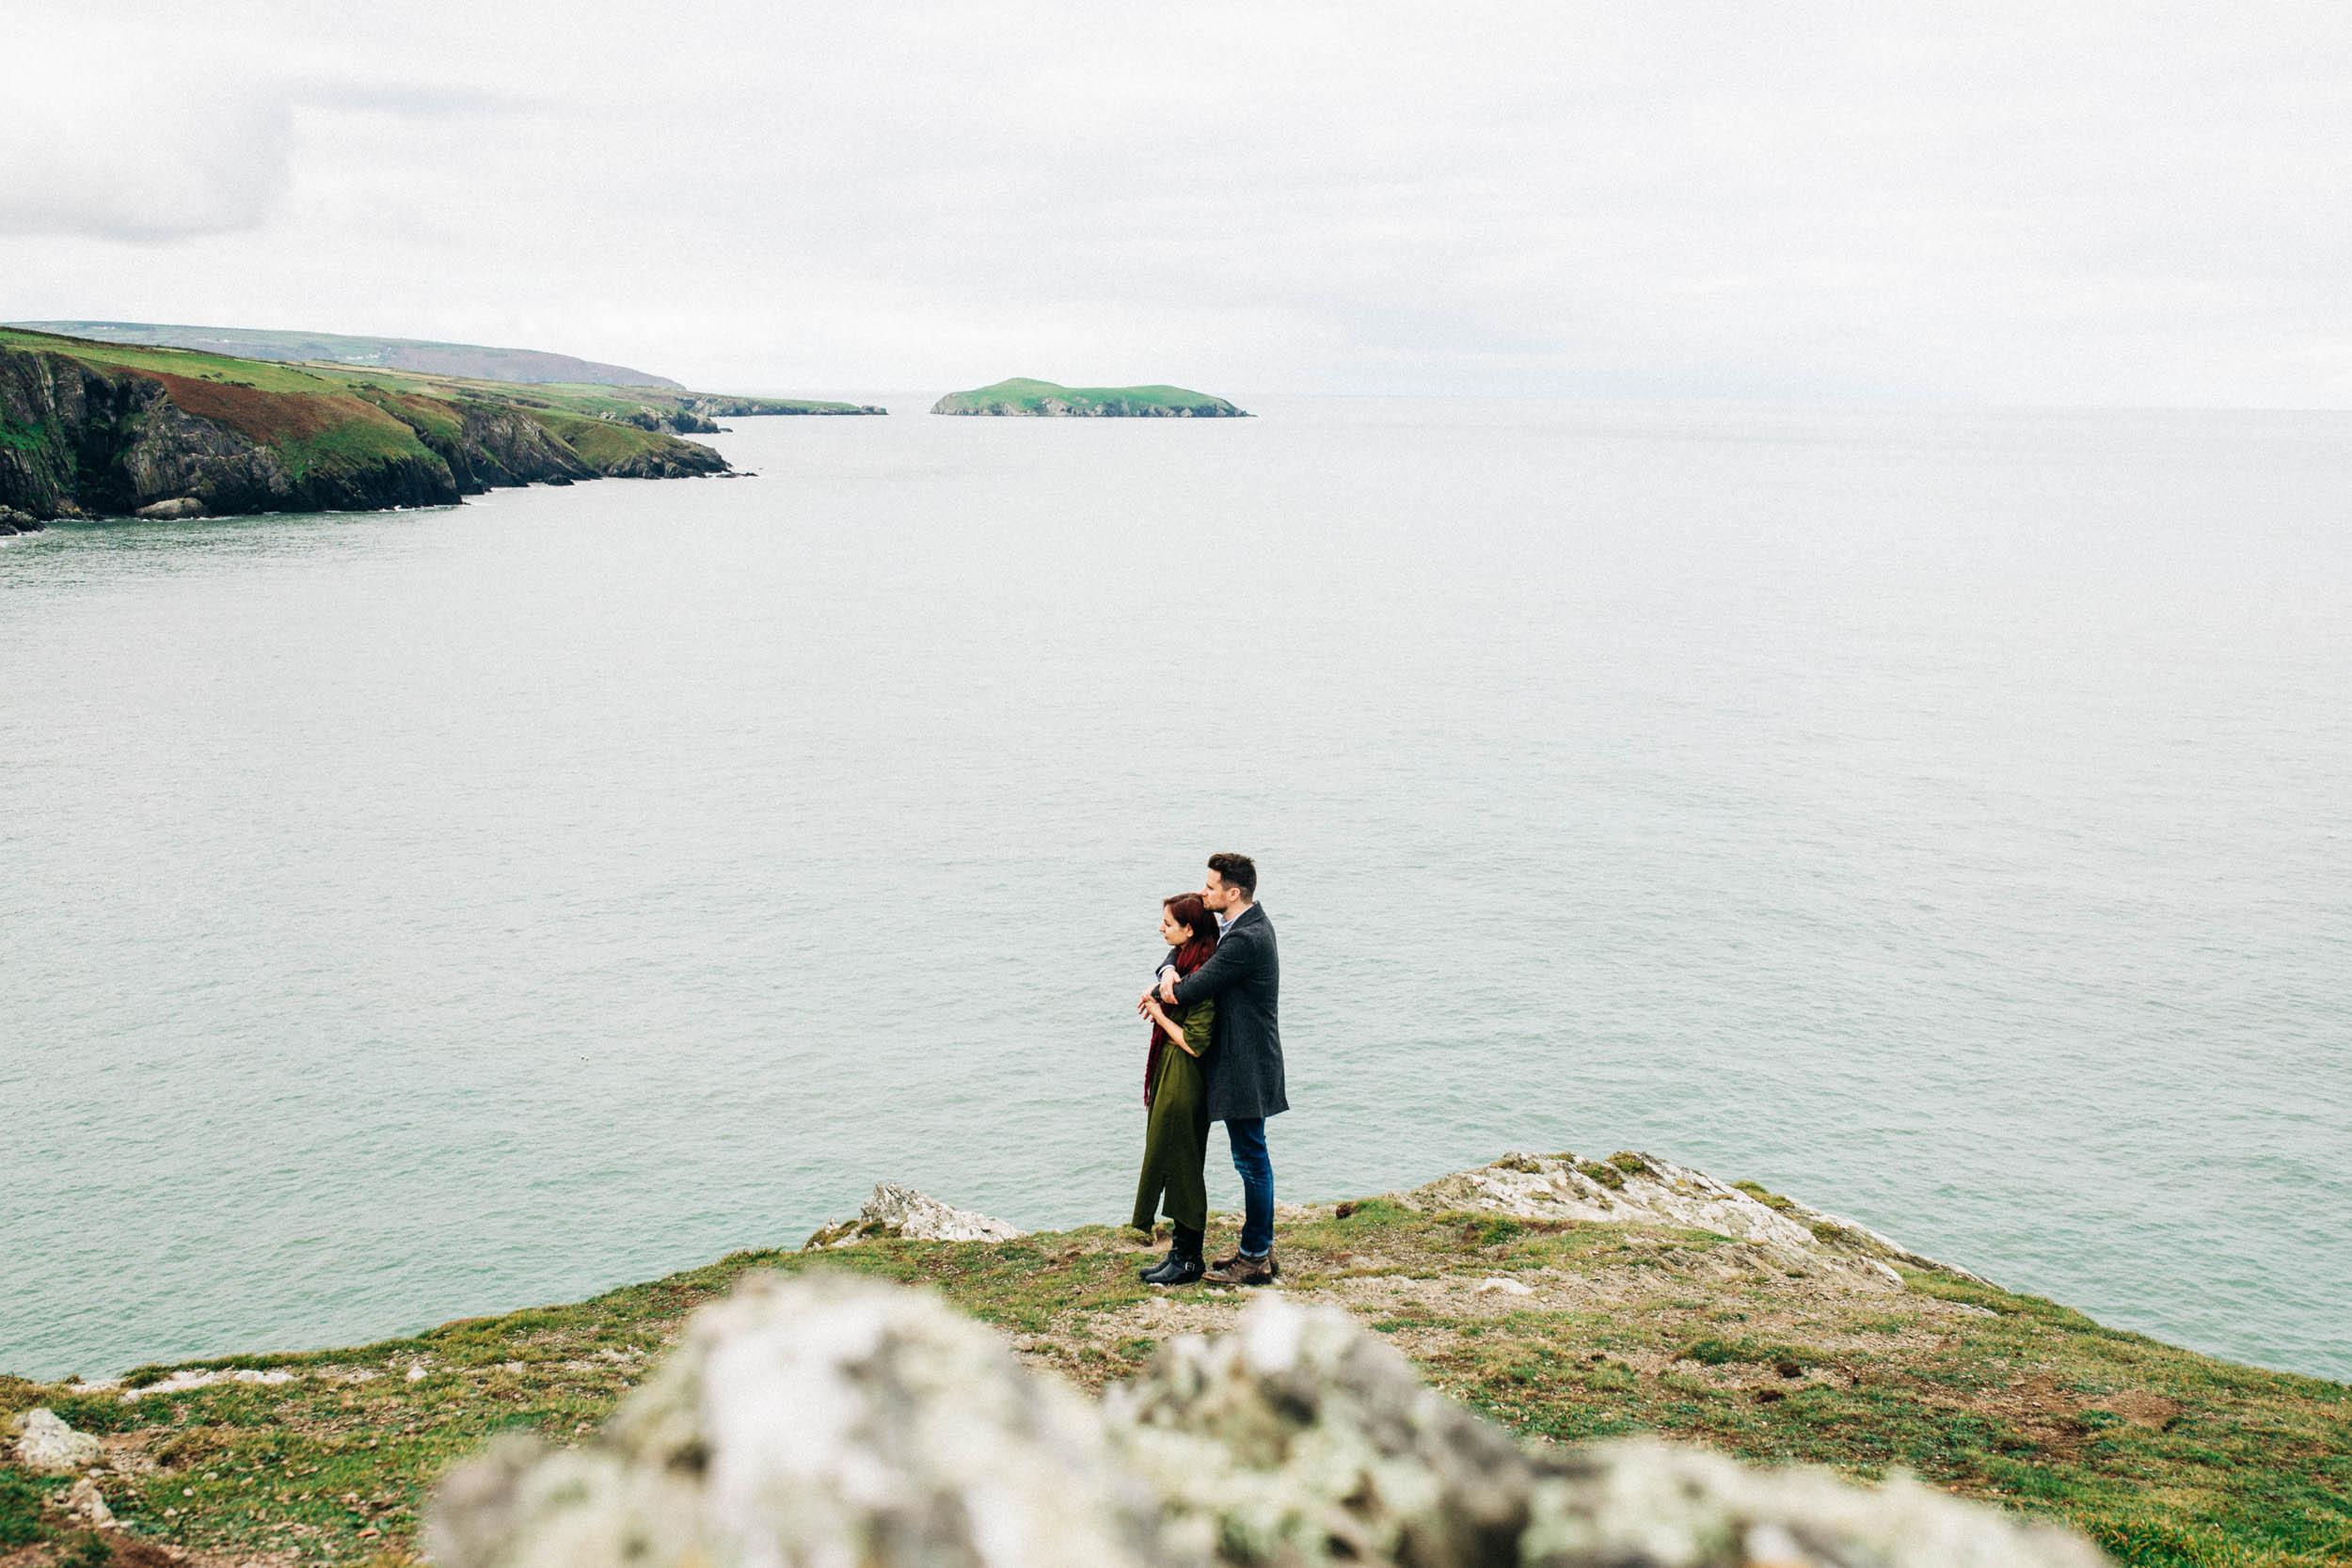 Alex_Sedgmond_Photography-SouthWalesWeddingPhotography-Wedding-Photographer-Cardiff-Southwaleswedding-couples-10.jpg